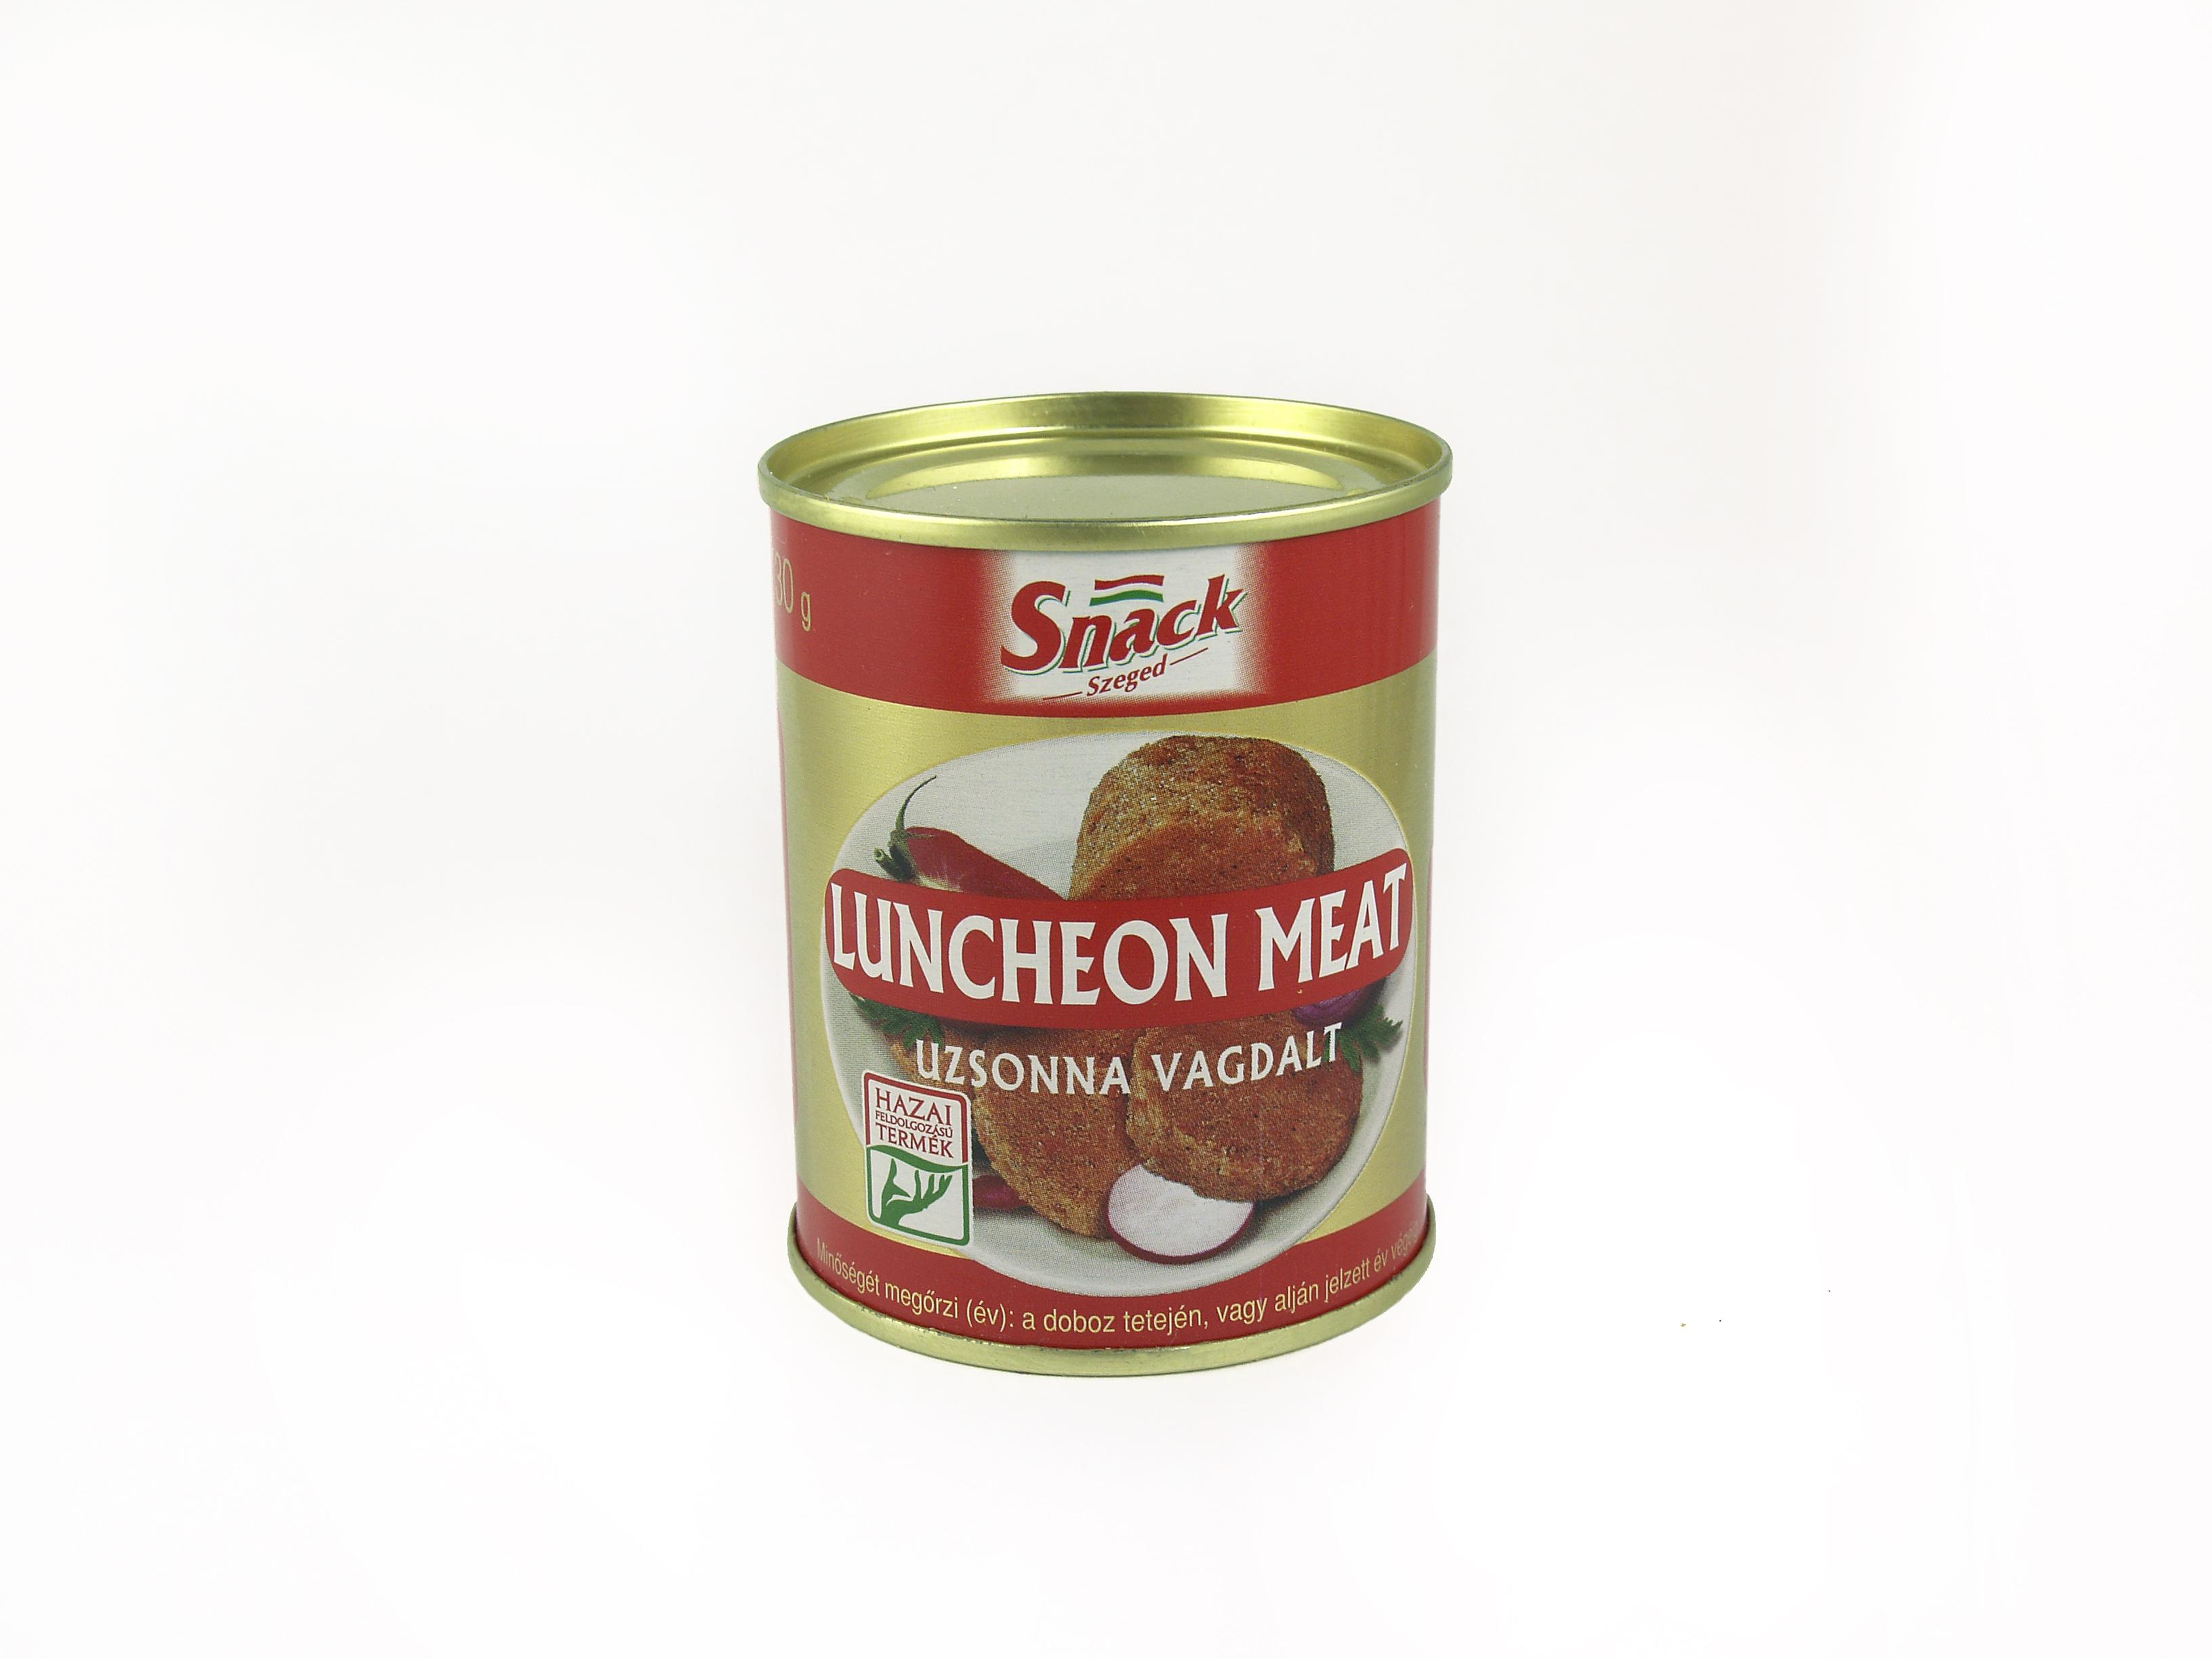 """Snack"" Luncheon meat uzsonnavagdalt 130g"